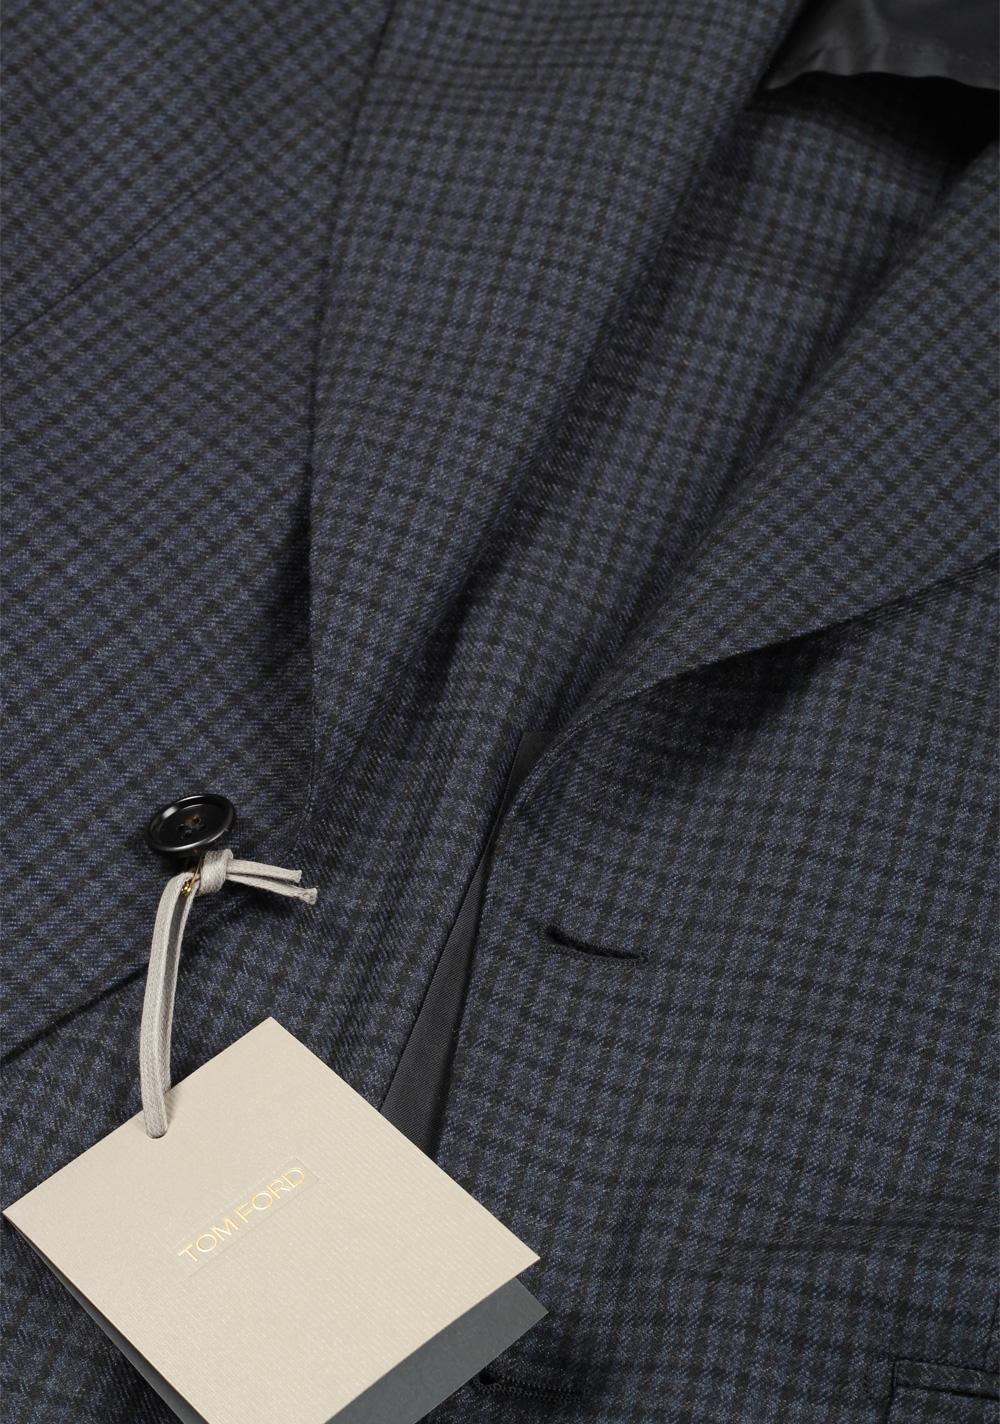 TOM FORD Atticus Blue Checked Sport Coat Size 46 / 36R U.S. | Costume Limité